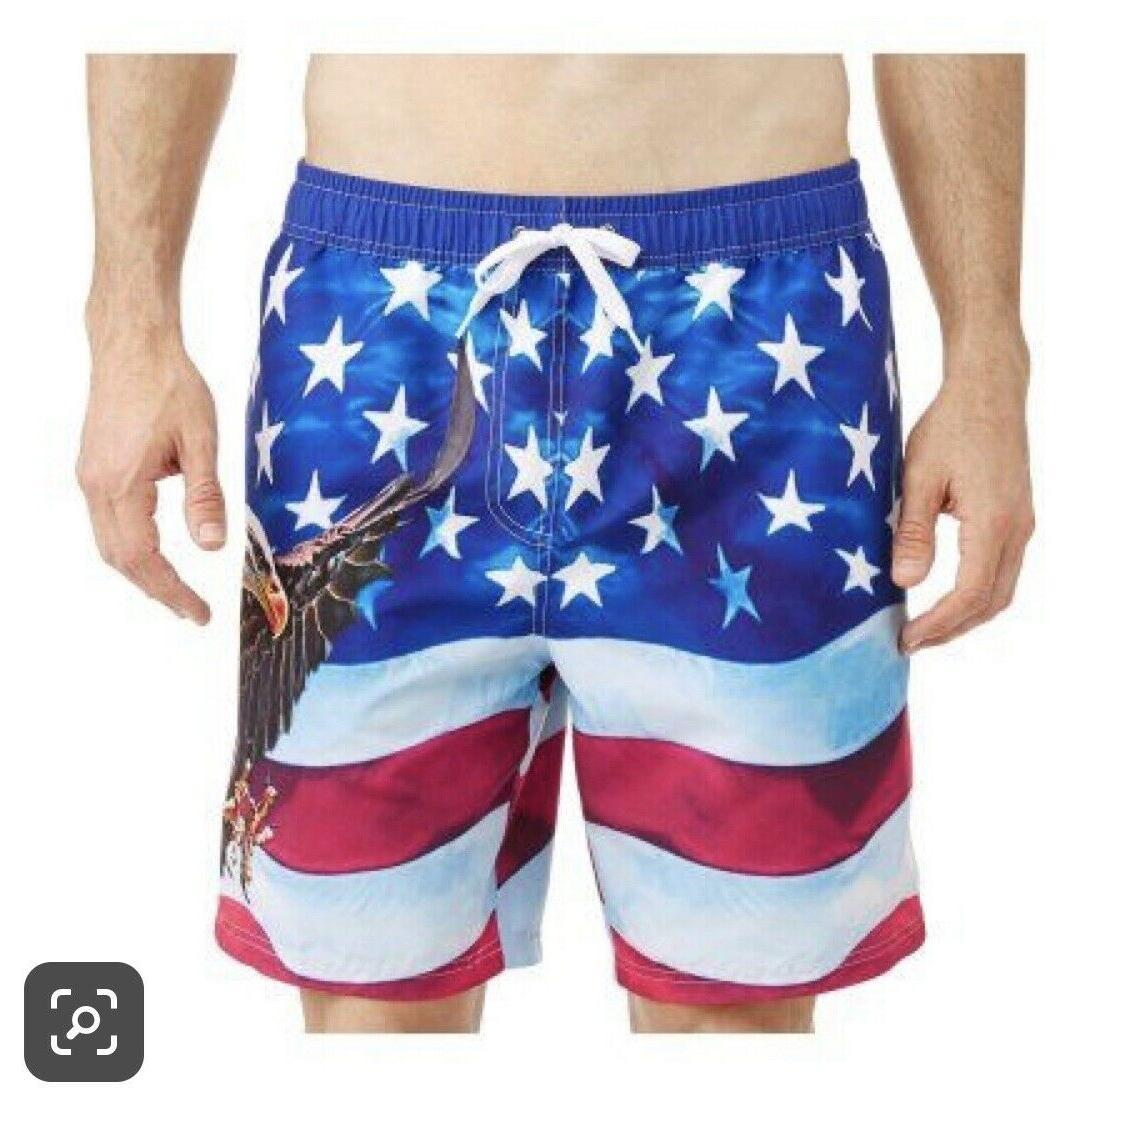 **ON SALE** Men's American Flag Trunks Board Shorts NWT BALD DESIGN